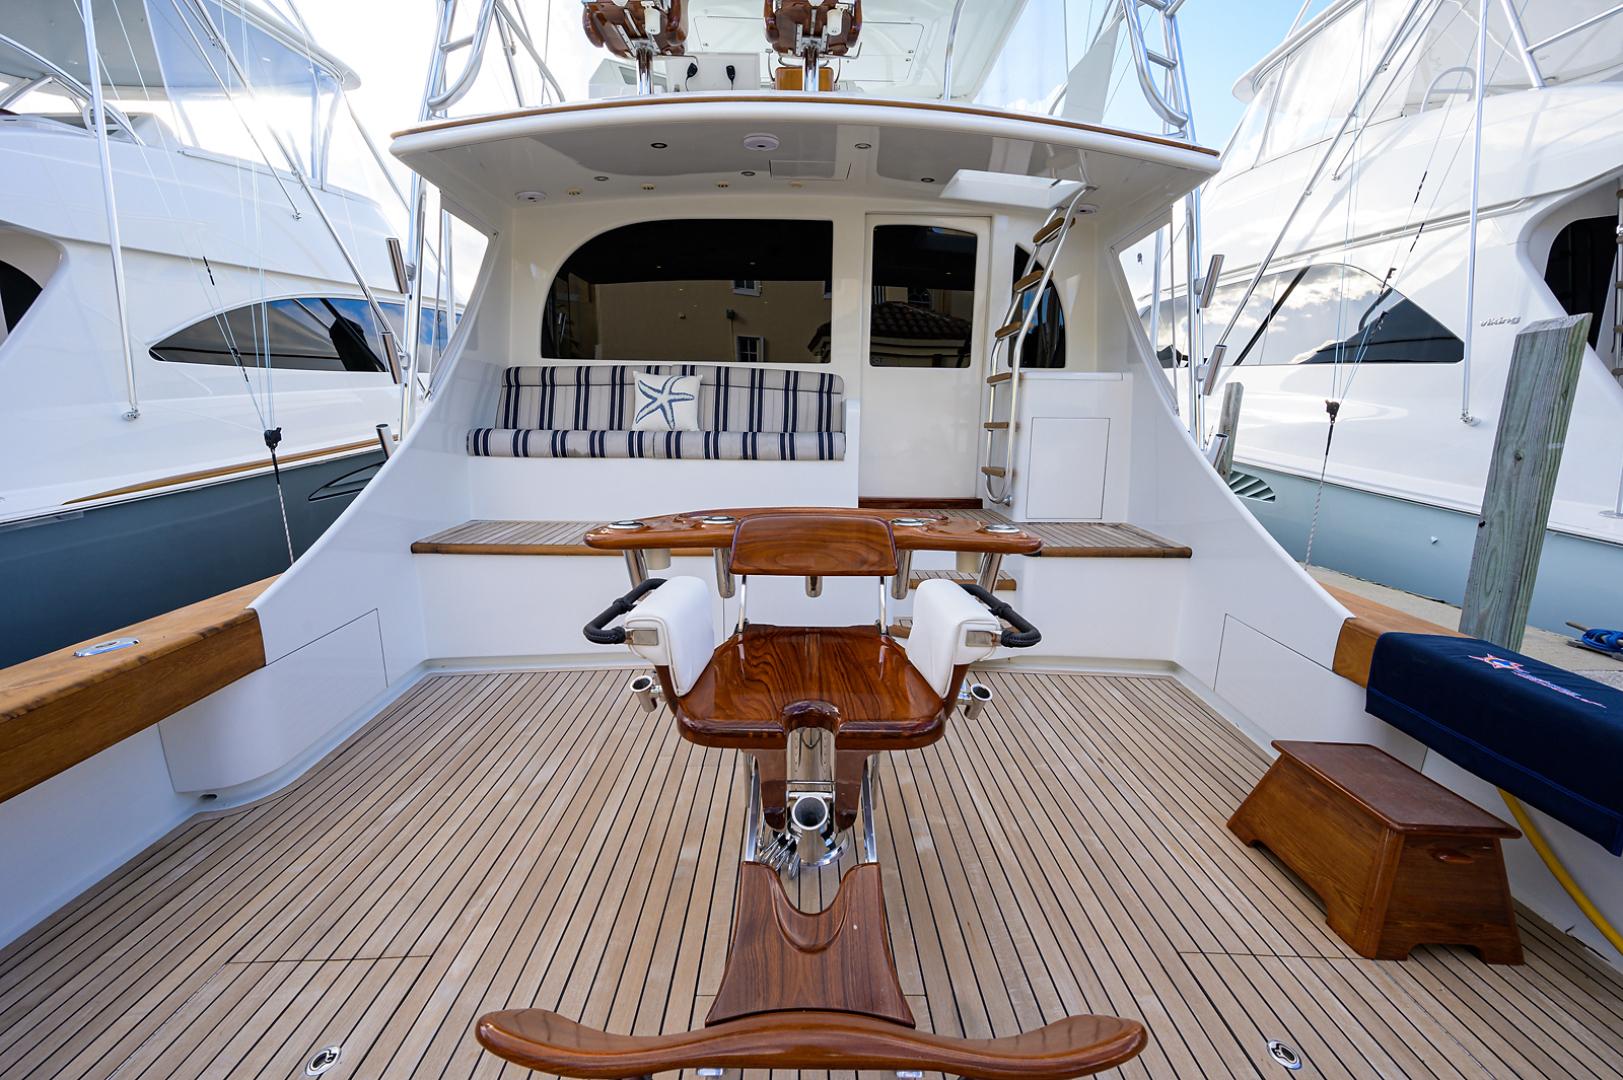 Titan-Convertible 2015-OVER RIDE PALM BEACH GARDENS-Florida-United States-Cockpit-1562370 | Thumbnail